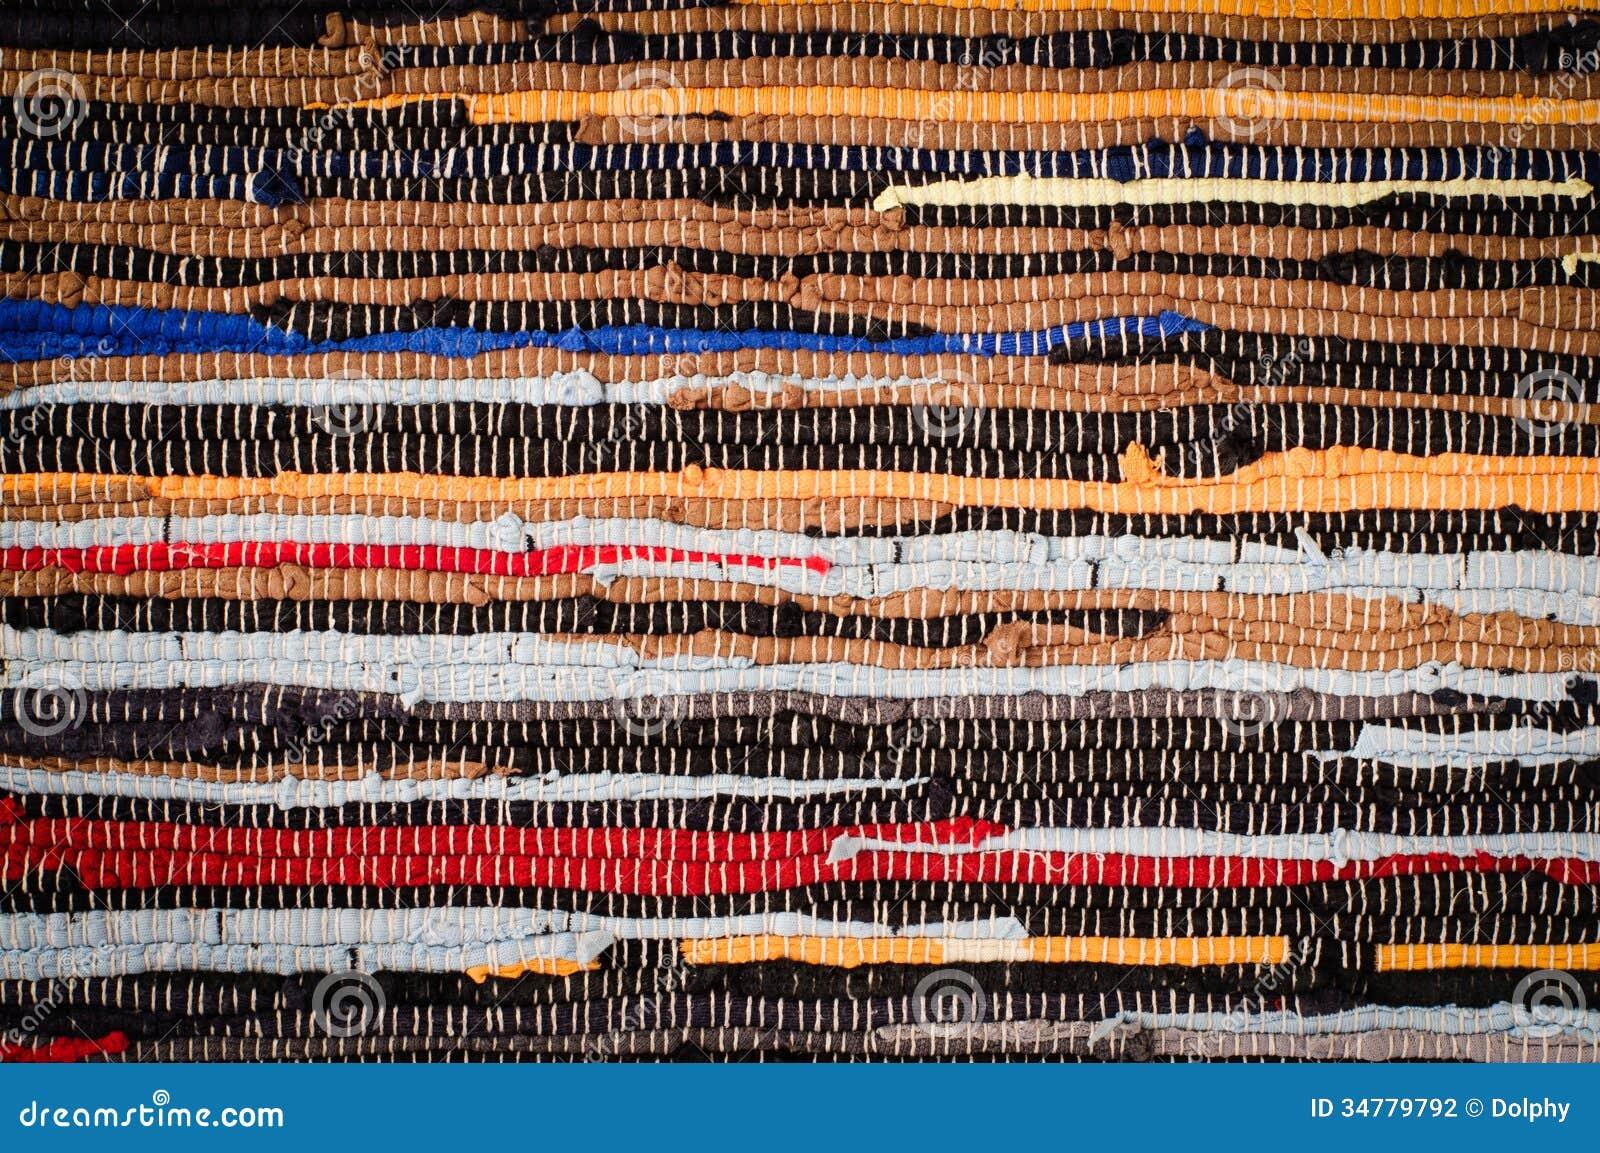 Handmade Cotton Rug Texture Stock Photo - Image: 34779792